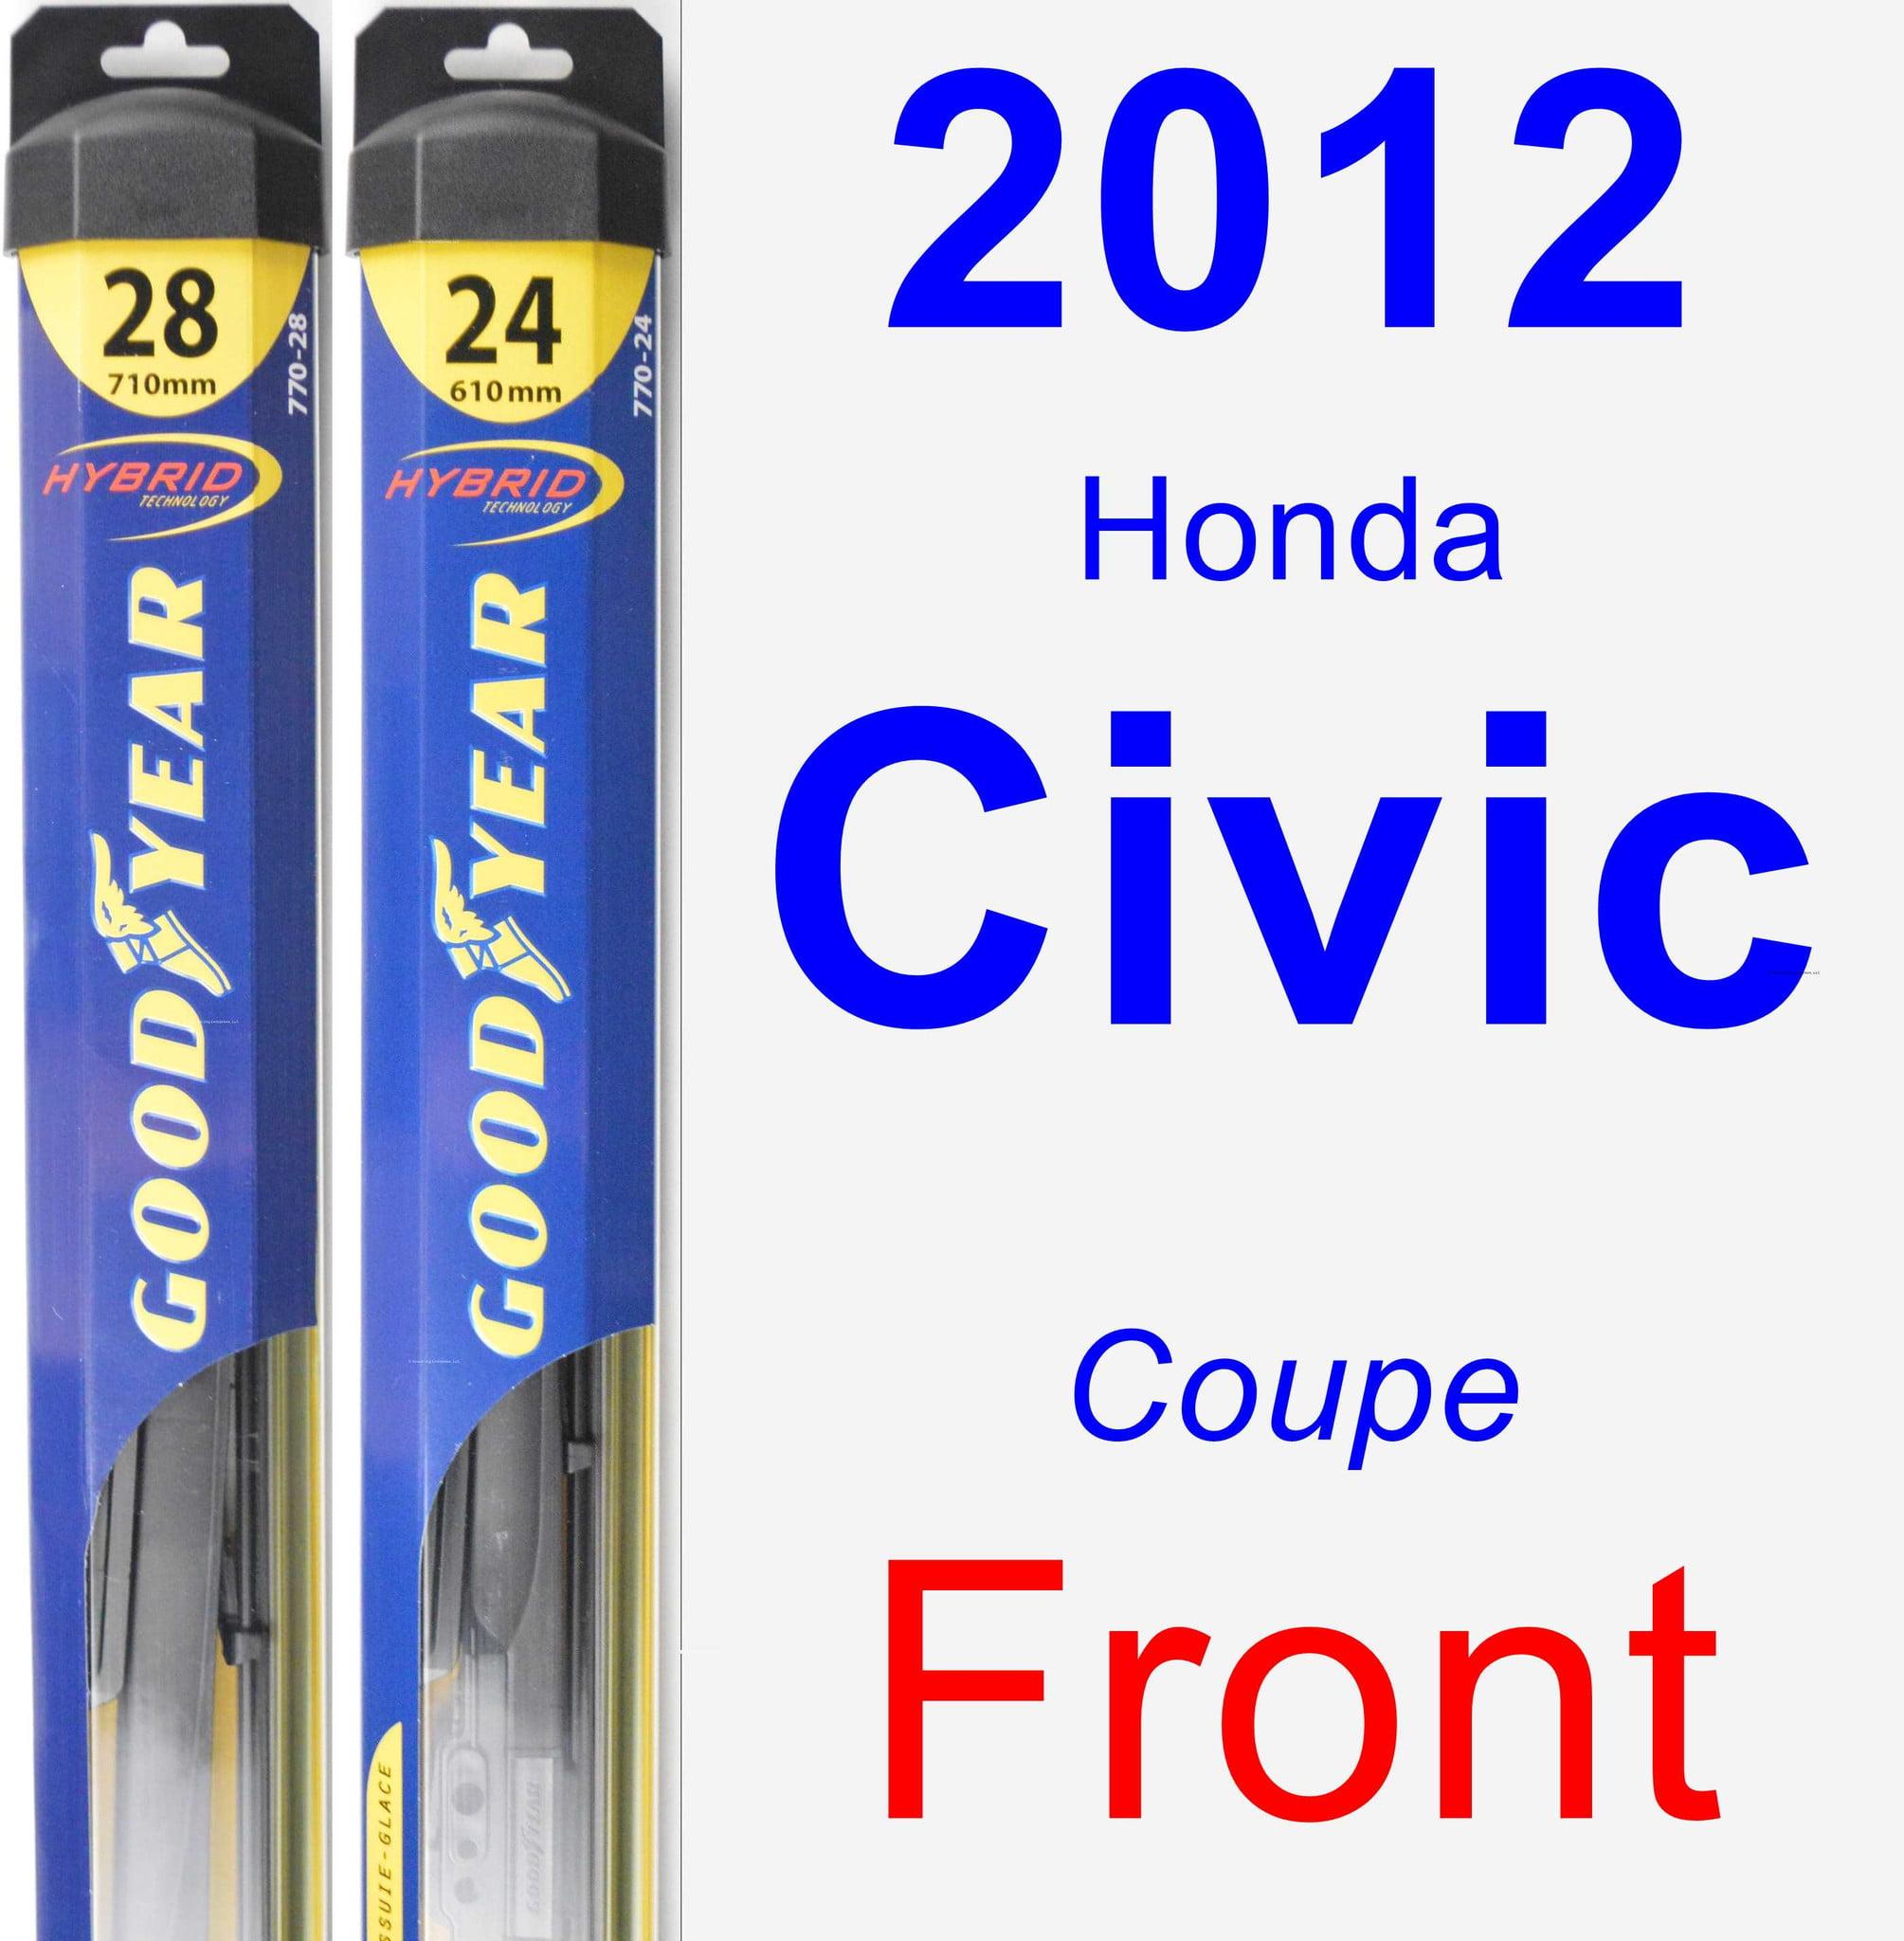 2012 Honda Civic Wiper Blade Set Kit Front 2 Blades Hybrid